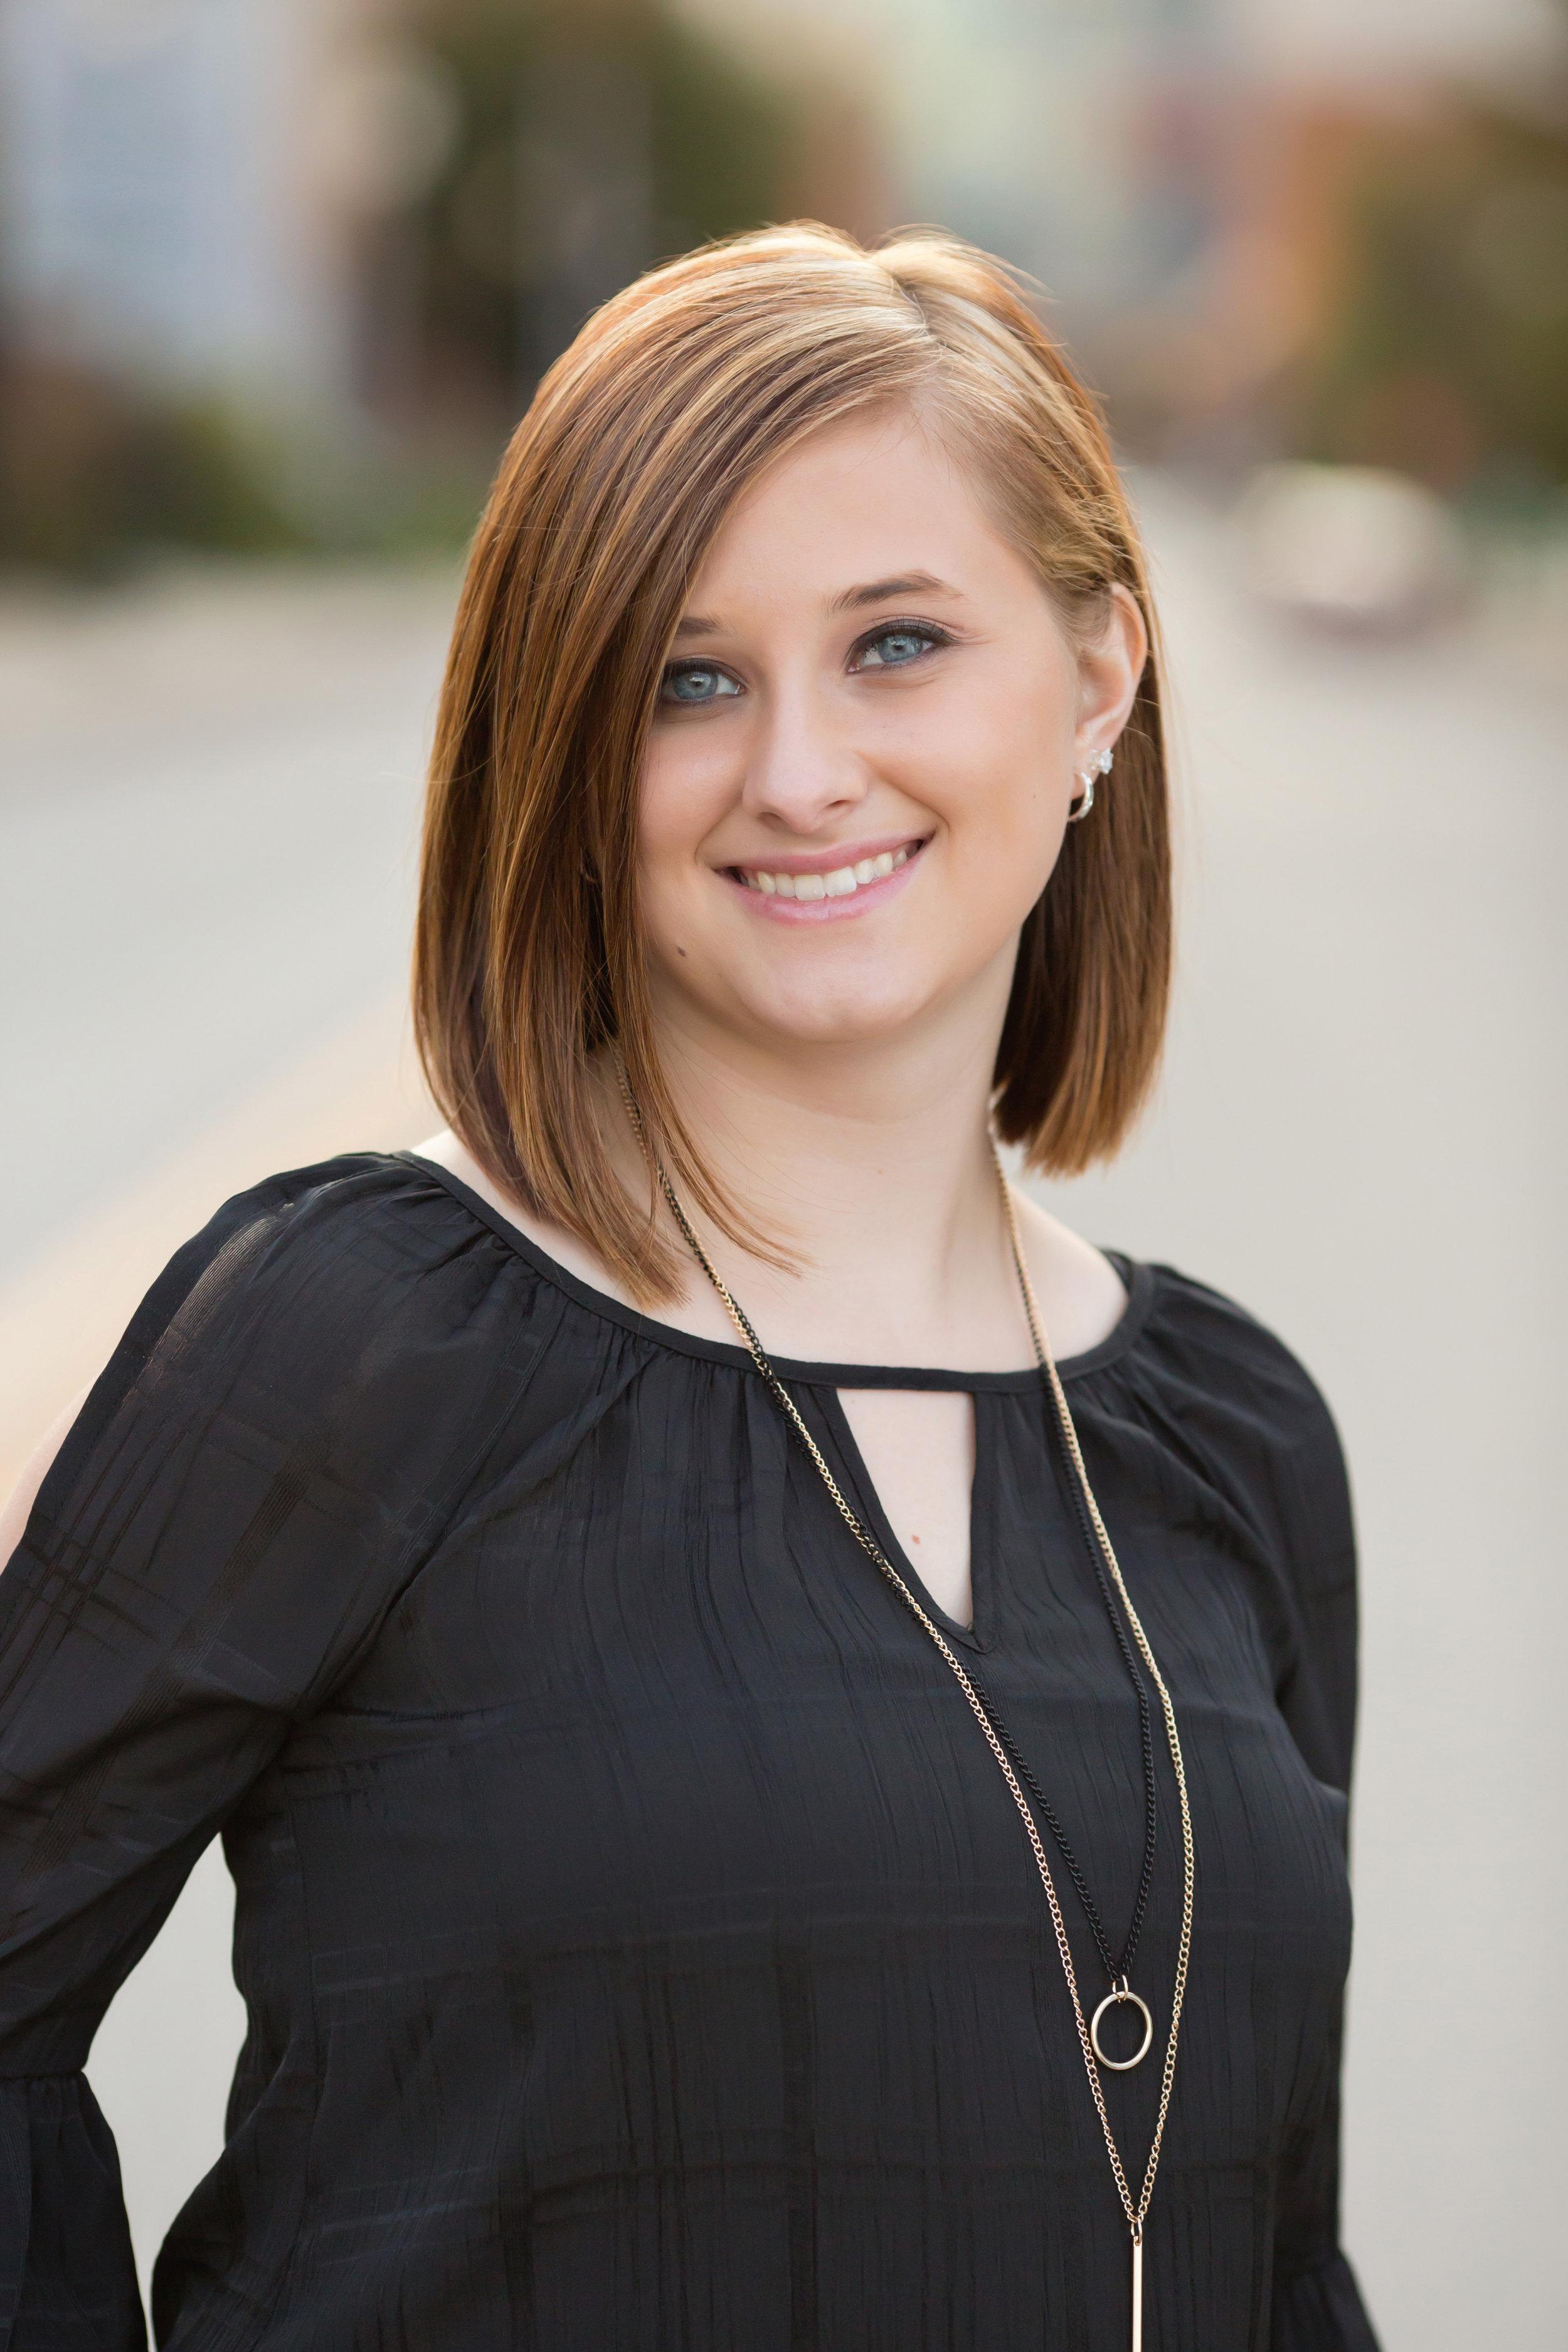 Casidy Stearman daughter of Jason Kilner